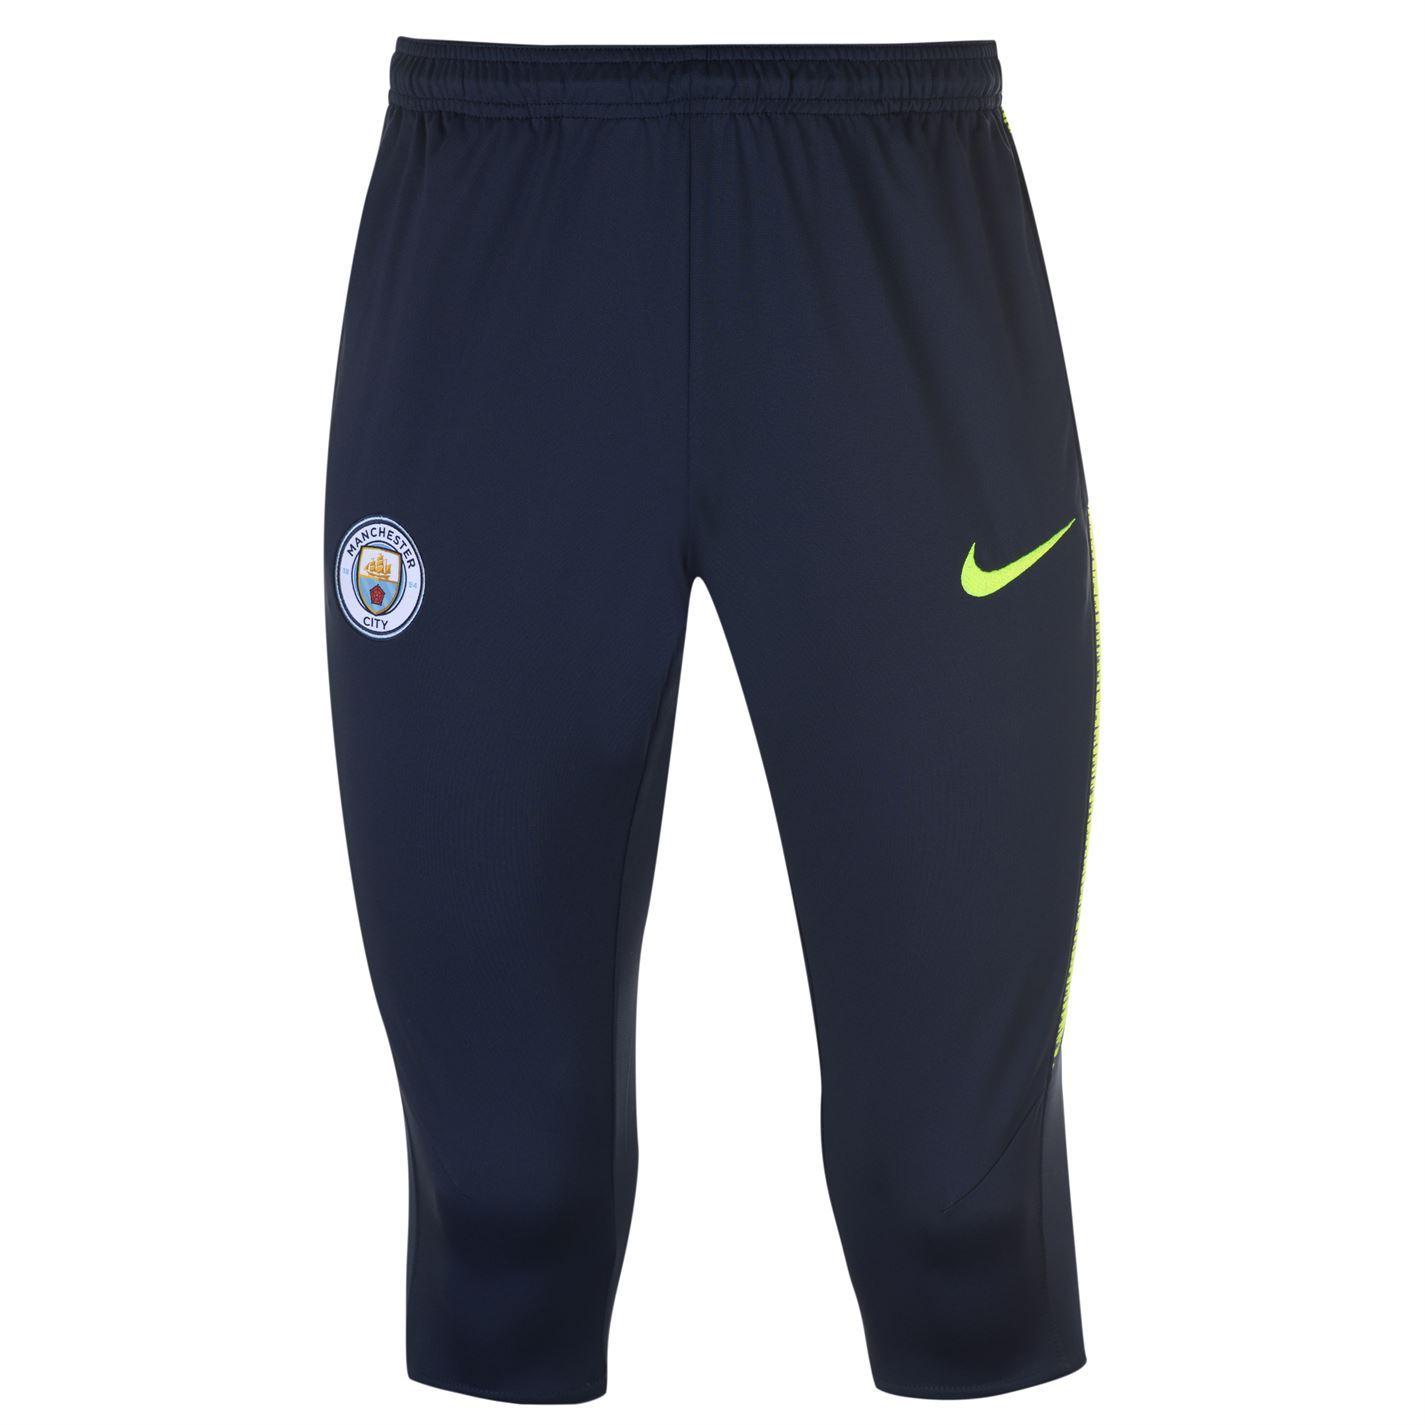 28d3b8df2f40 ... Nike Manchester City 3 4 Pants Mens Blue Football Soccer Track Sweat  Bottoms ...